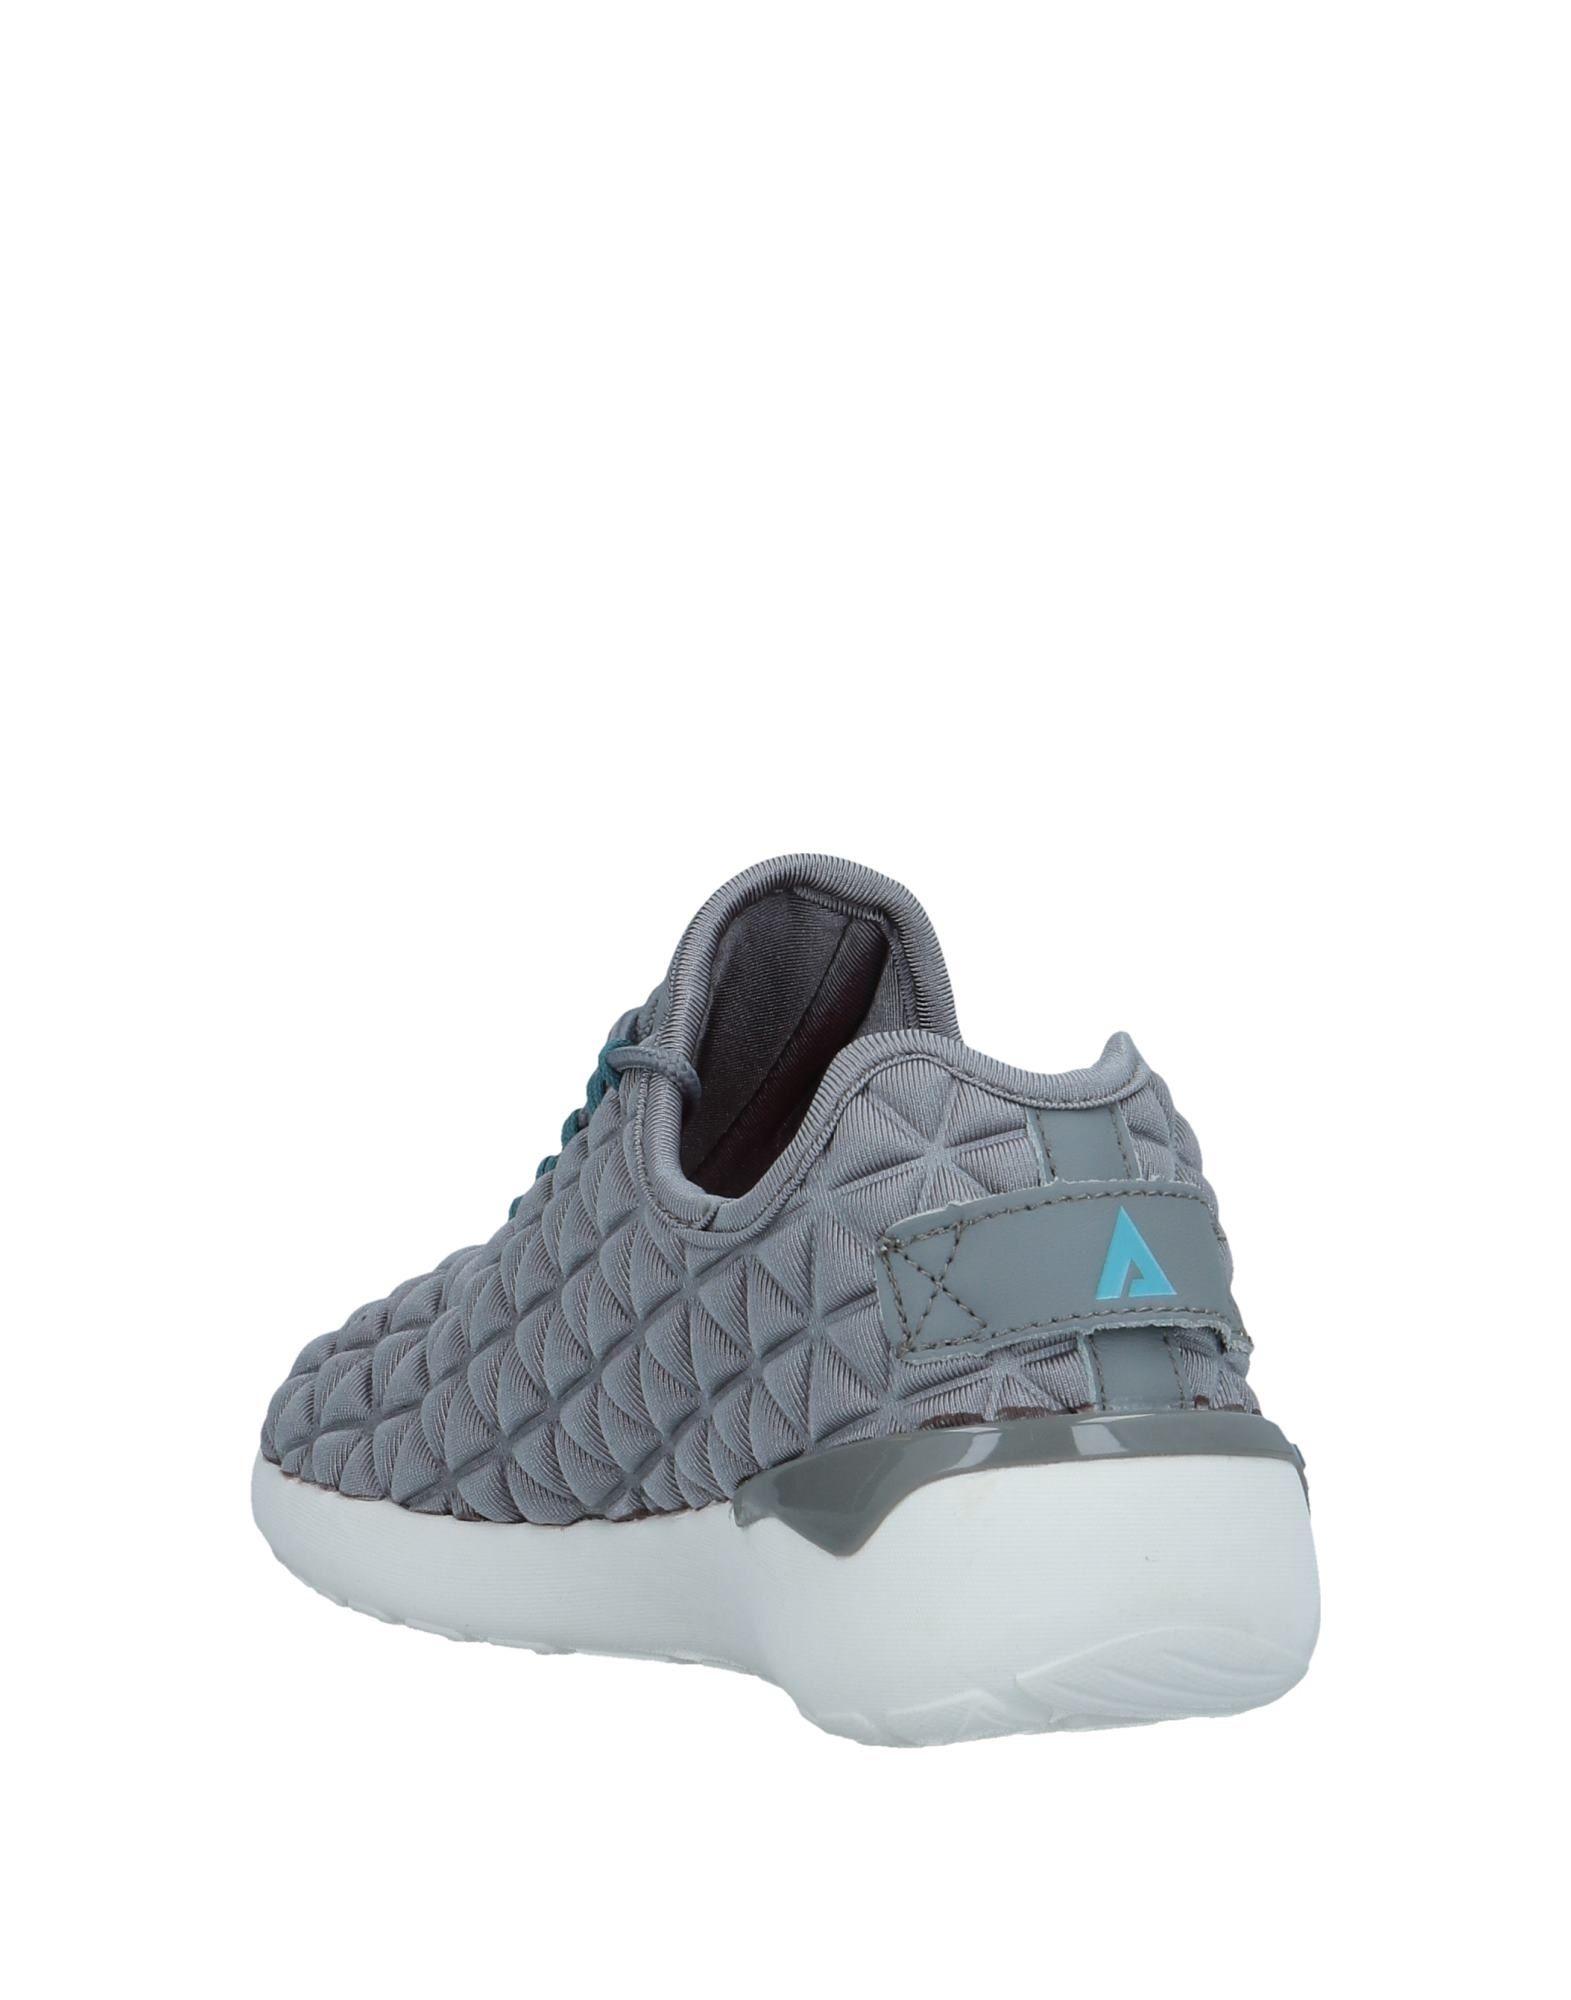 Asfvlt Asfvlt Asfvlt Sneakers - Women Asfvlt Sneakers online on  United Kingdom - 11506988GJ b72bac